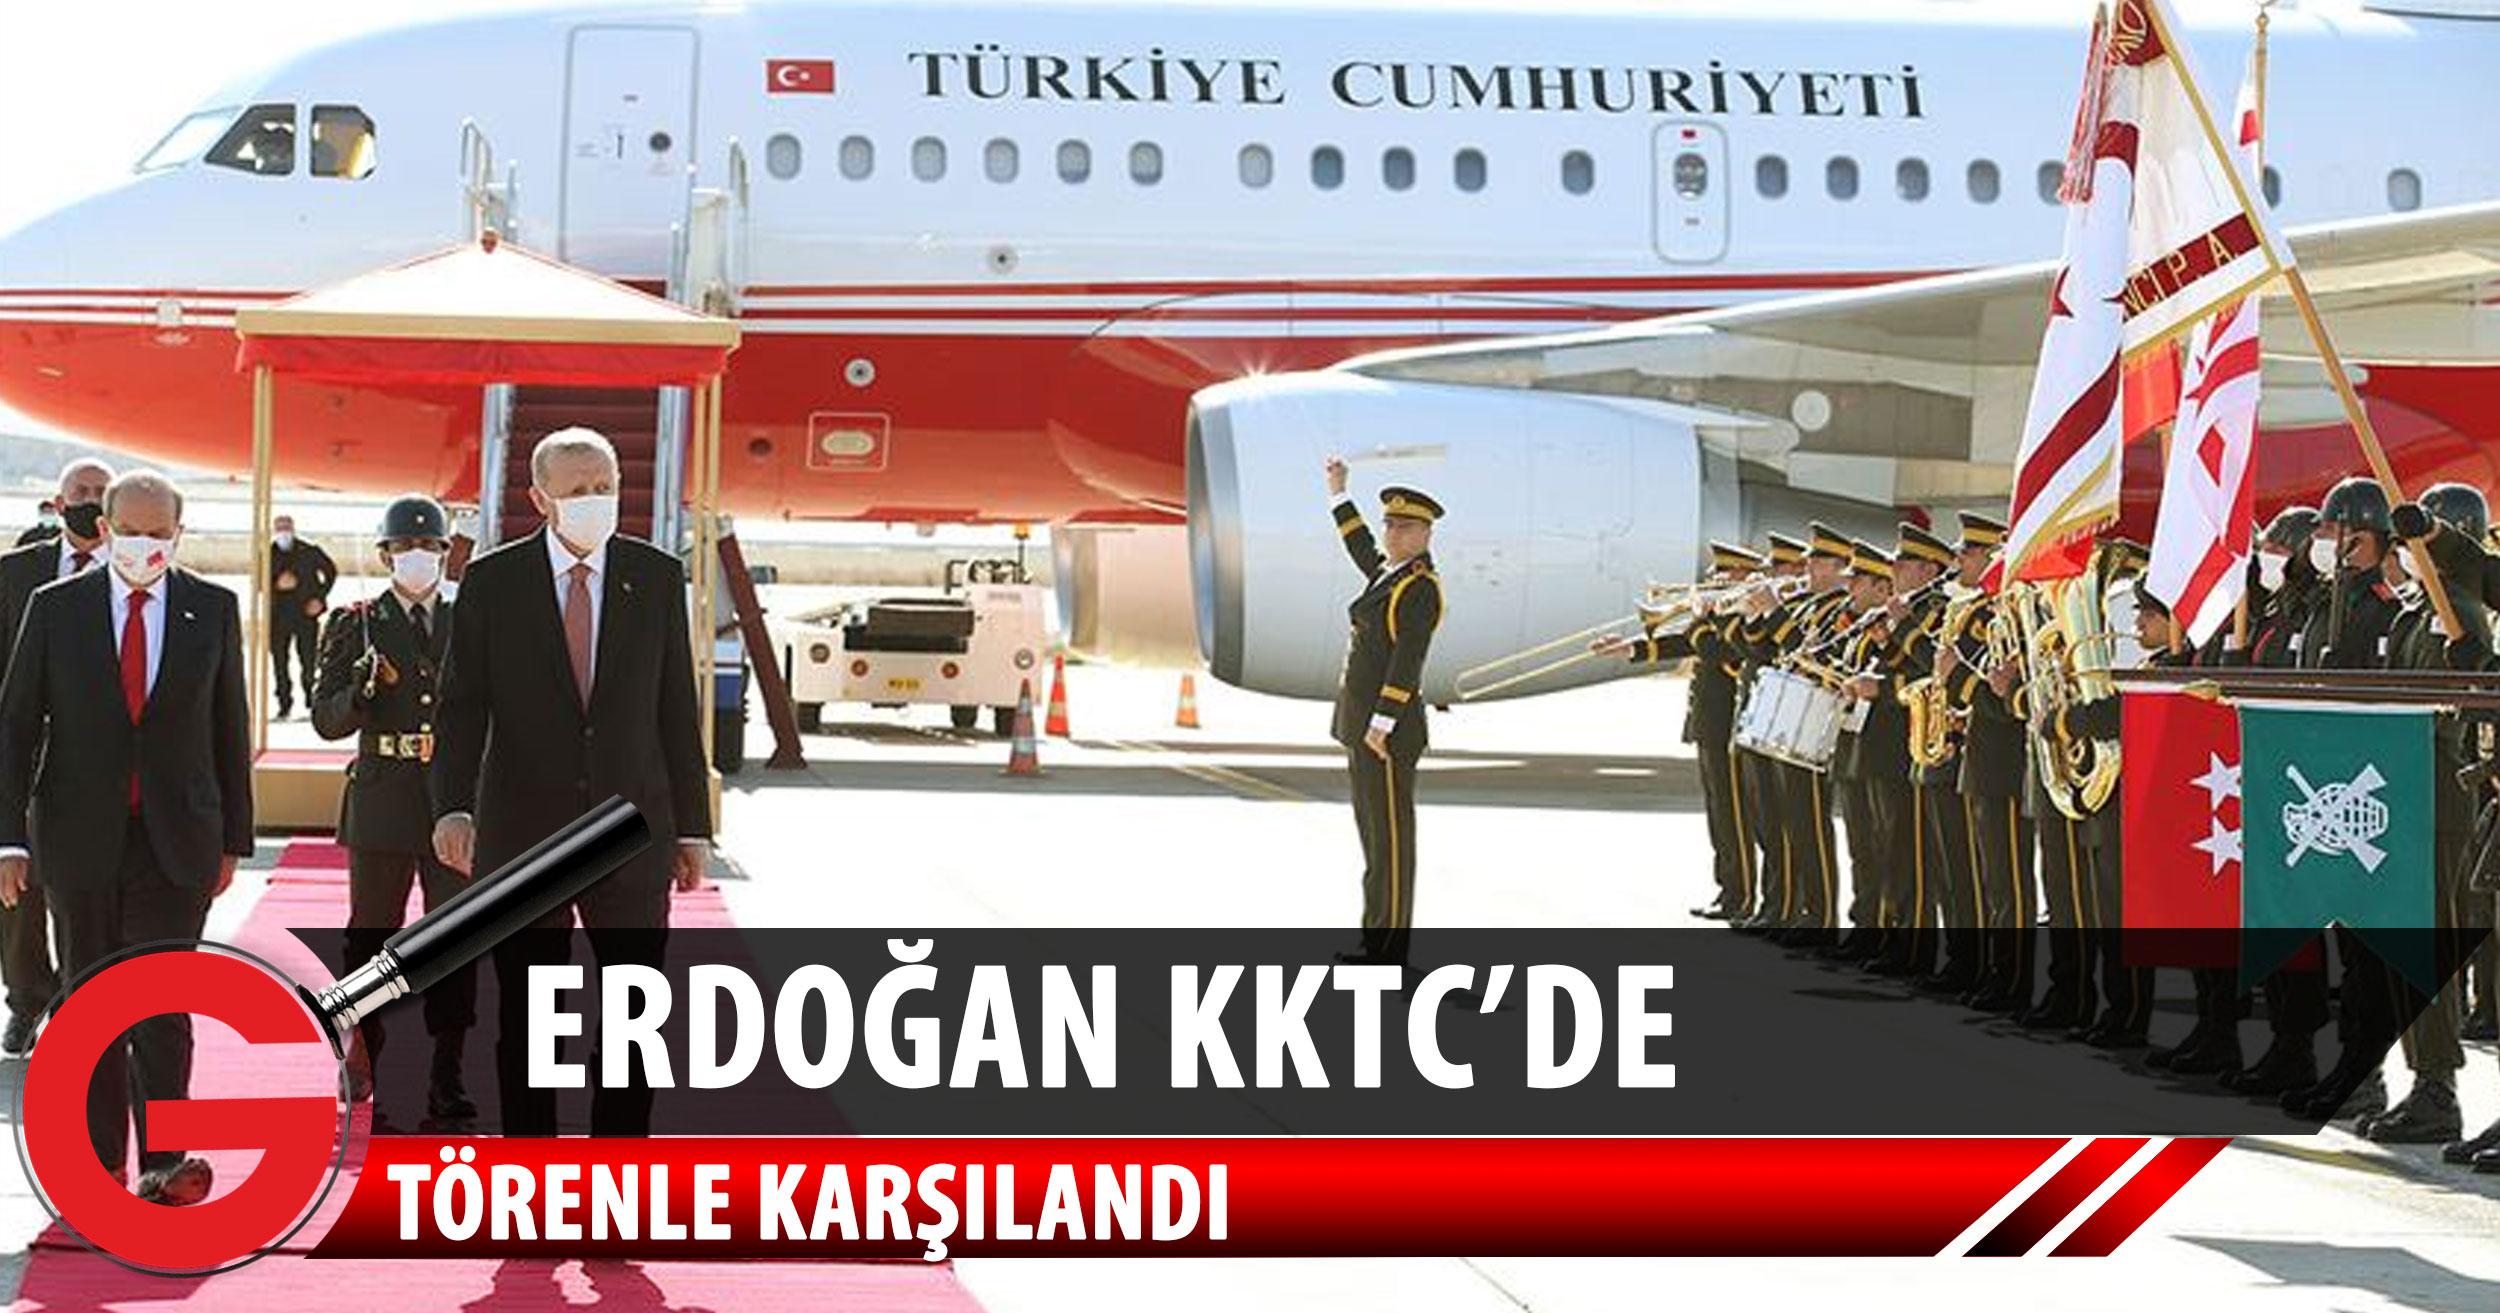 Erdoğan KKTC'de